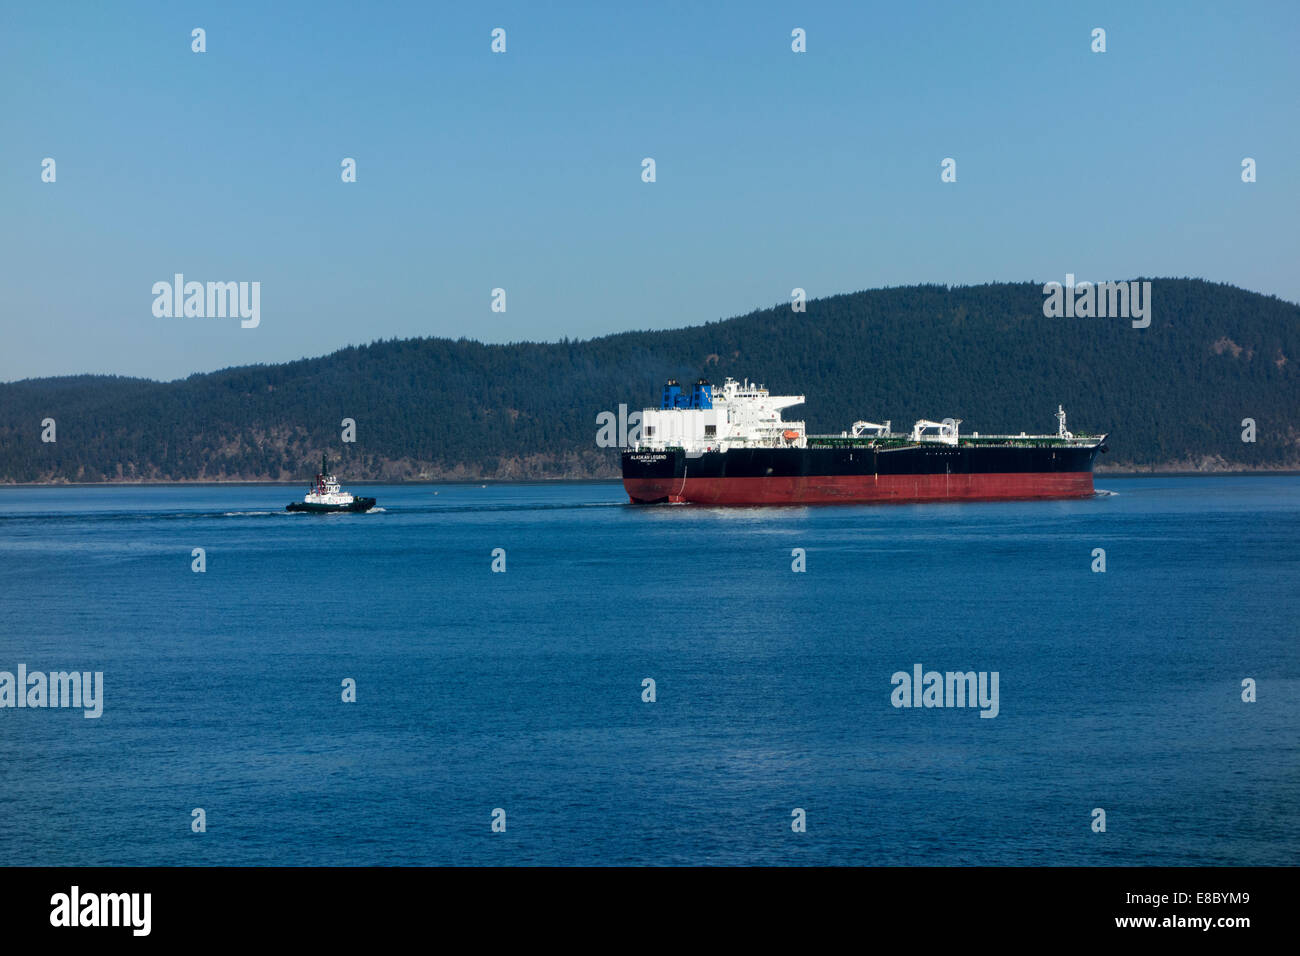 Alaskan Legend crude oil tanker with tugboat, San Juan Islands, Washington State, USA - Stock Image